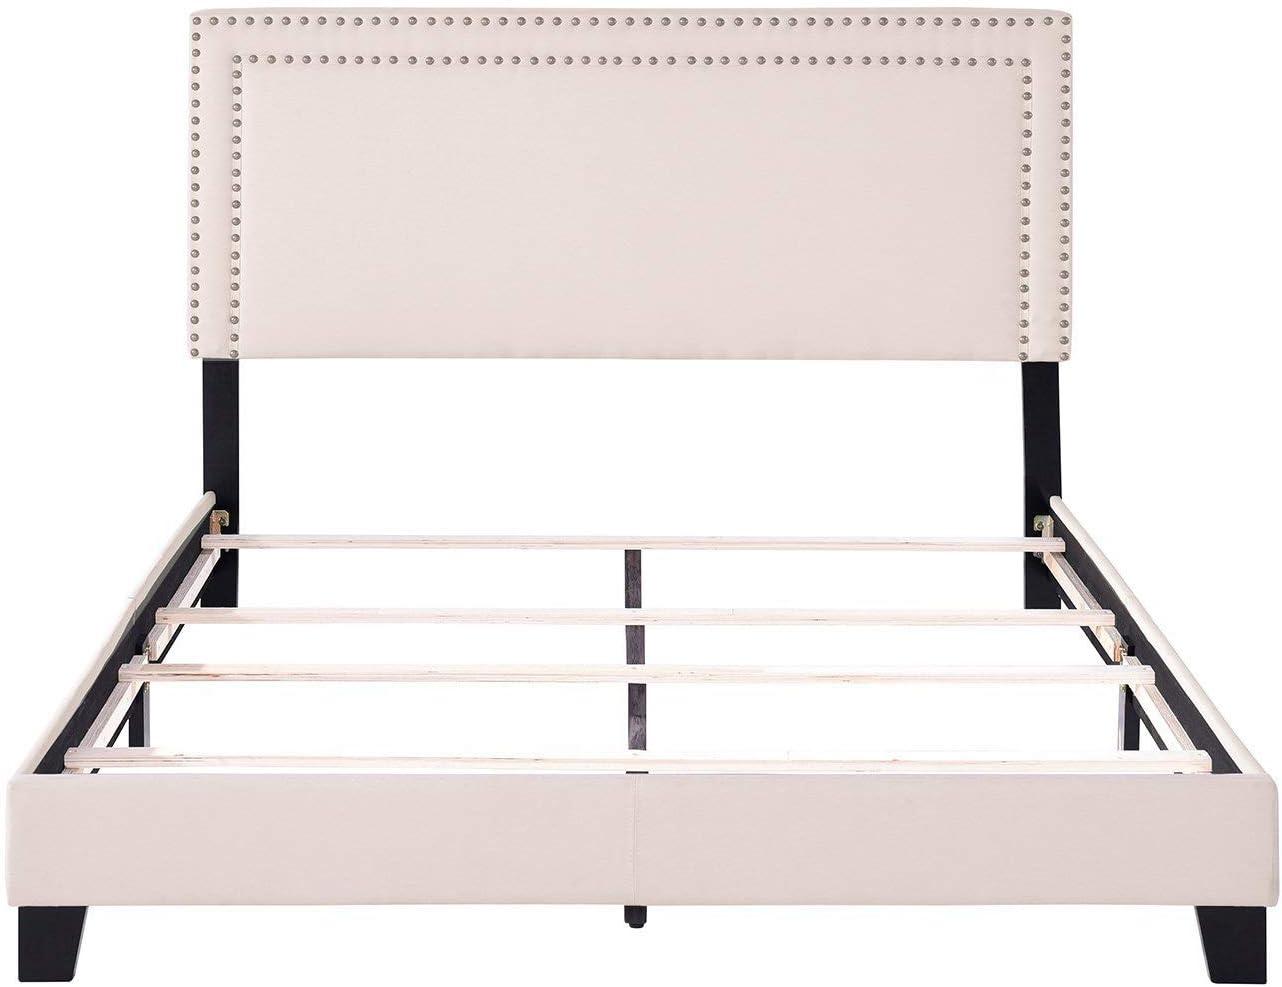 LZ LEISURE ZONE Full Bed Frame Upholstered Platform Mattress Foundation with Wooden Slat Support Nailhead Headboard Beige, Full